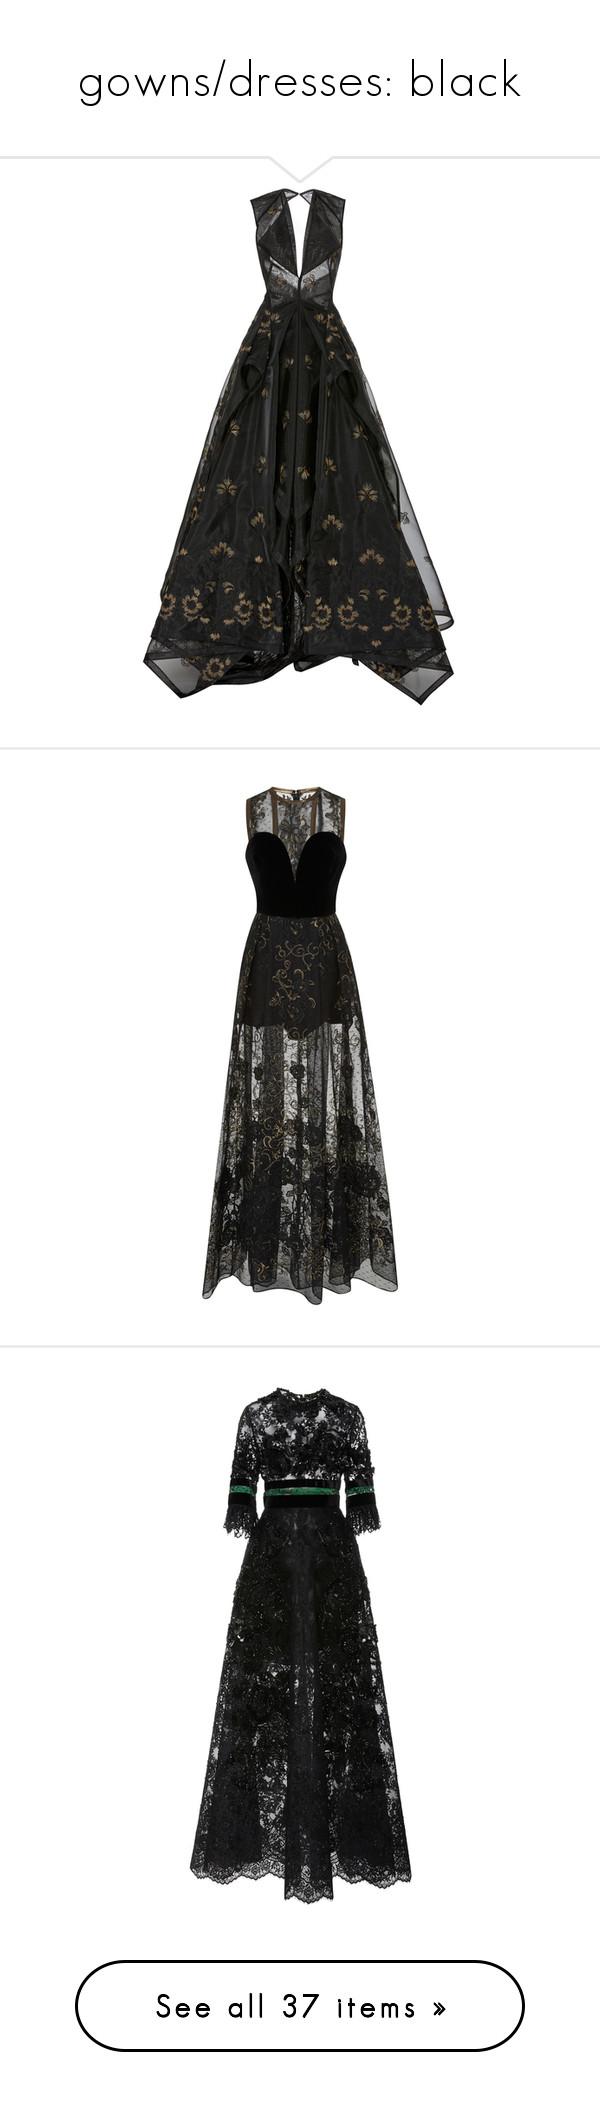 Gownsdresses black